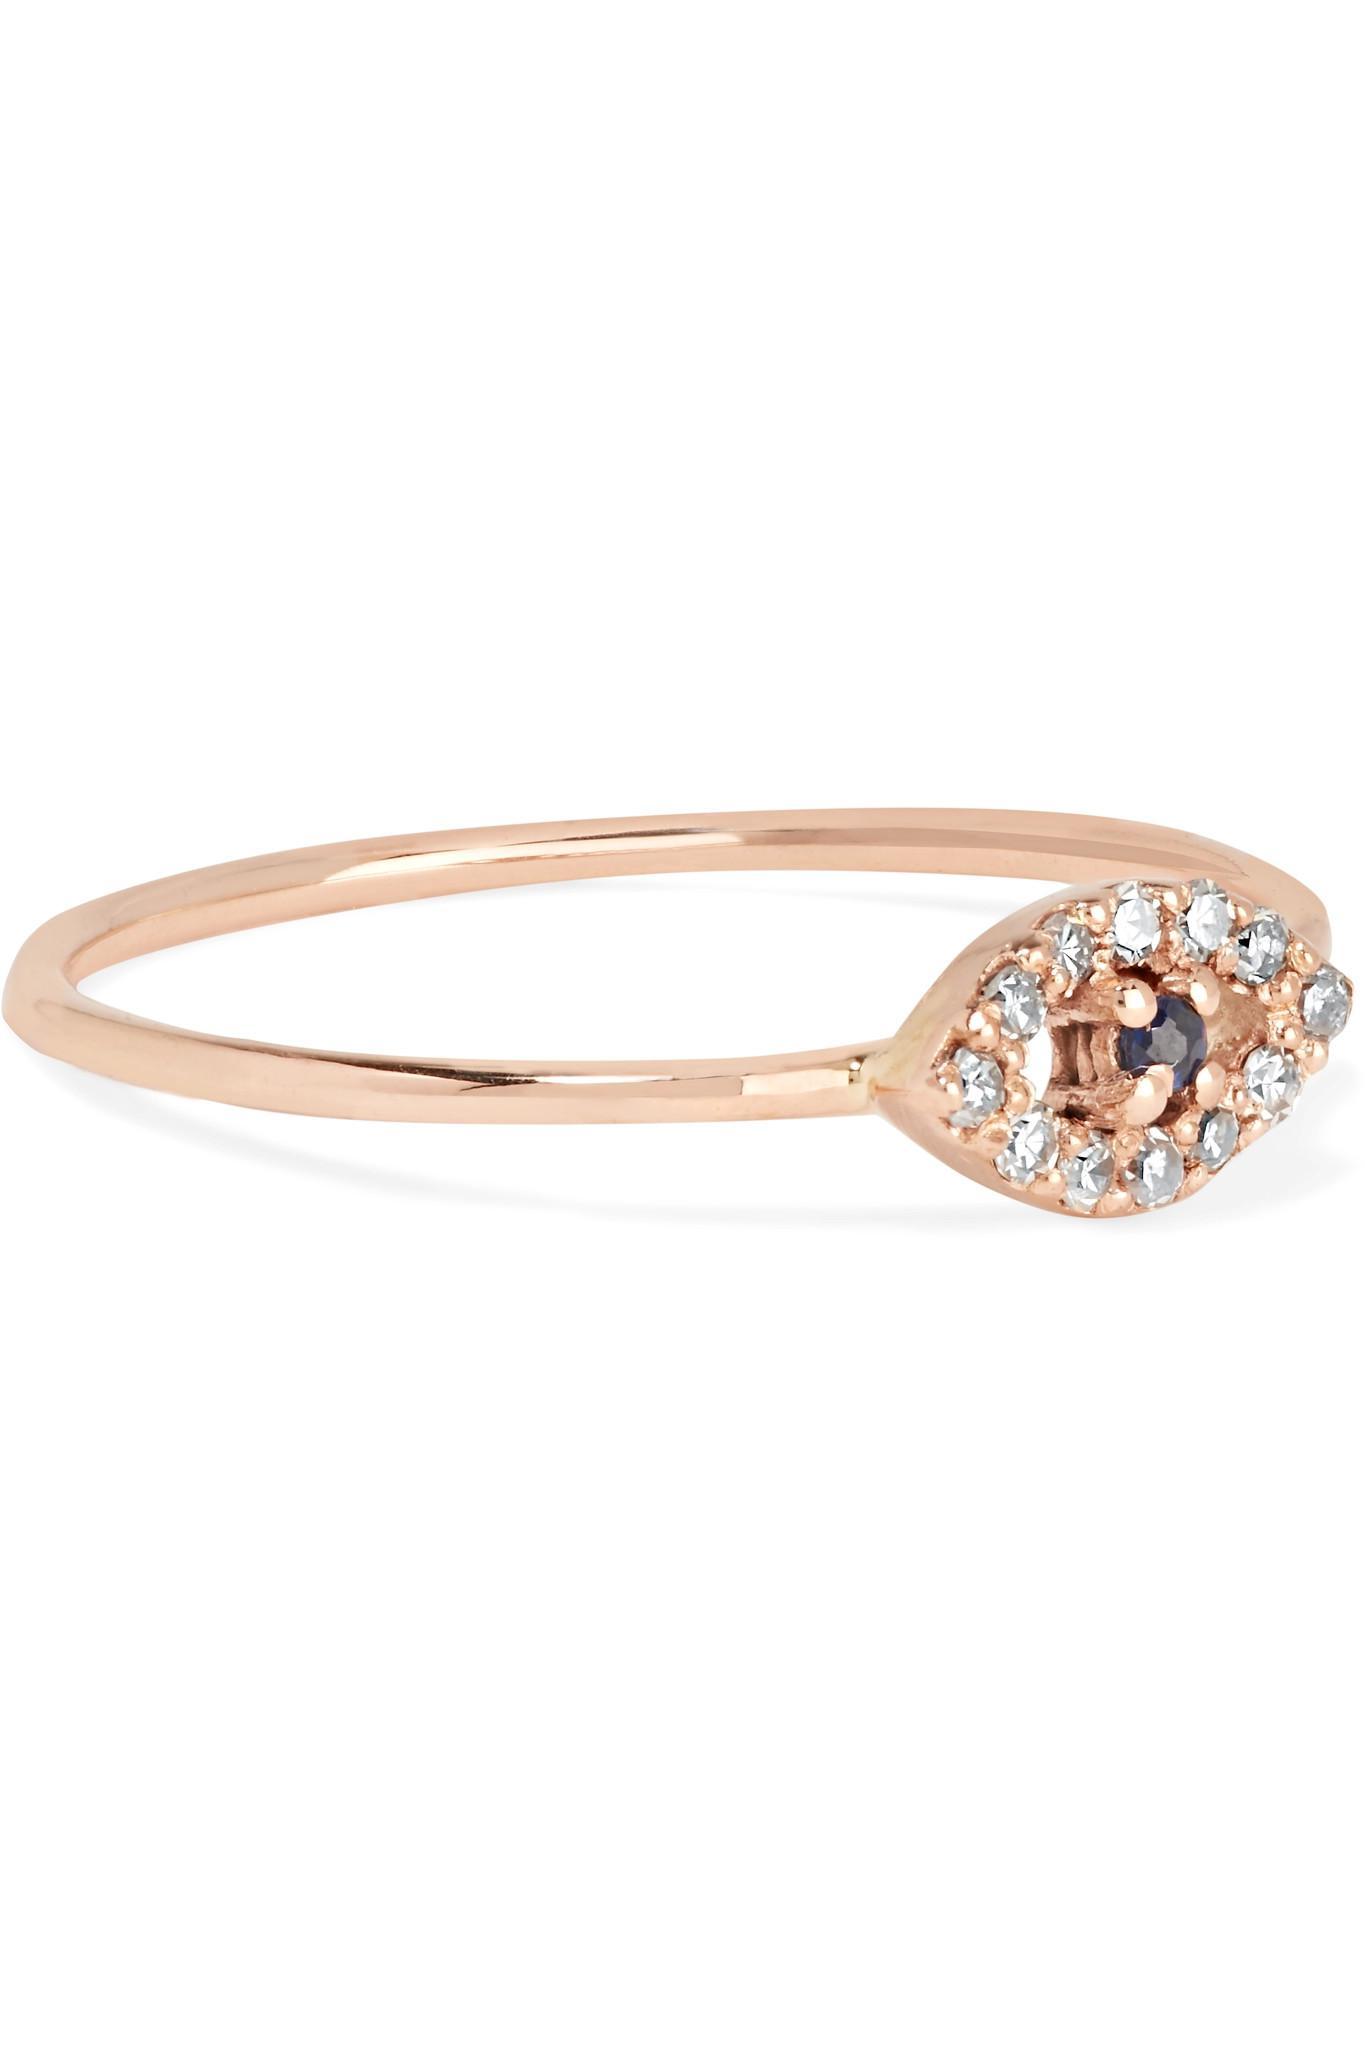 Diamond, sapphire & rose-gold ring Ileana Makri